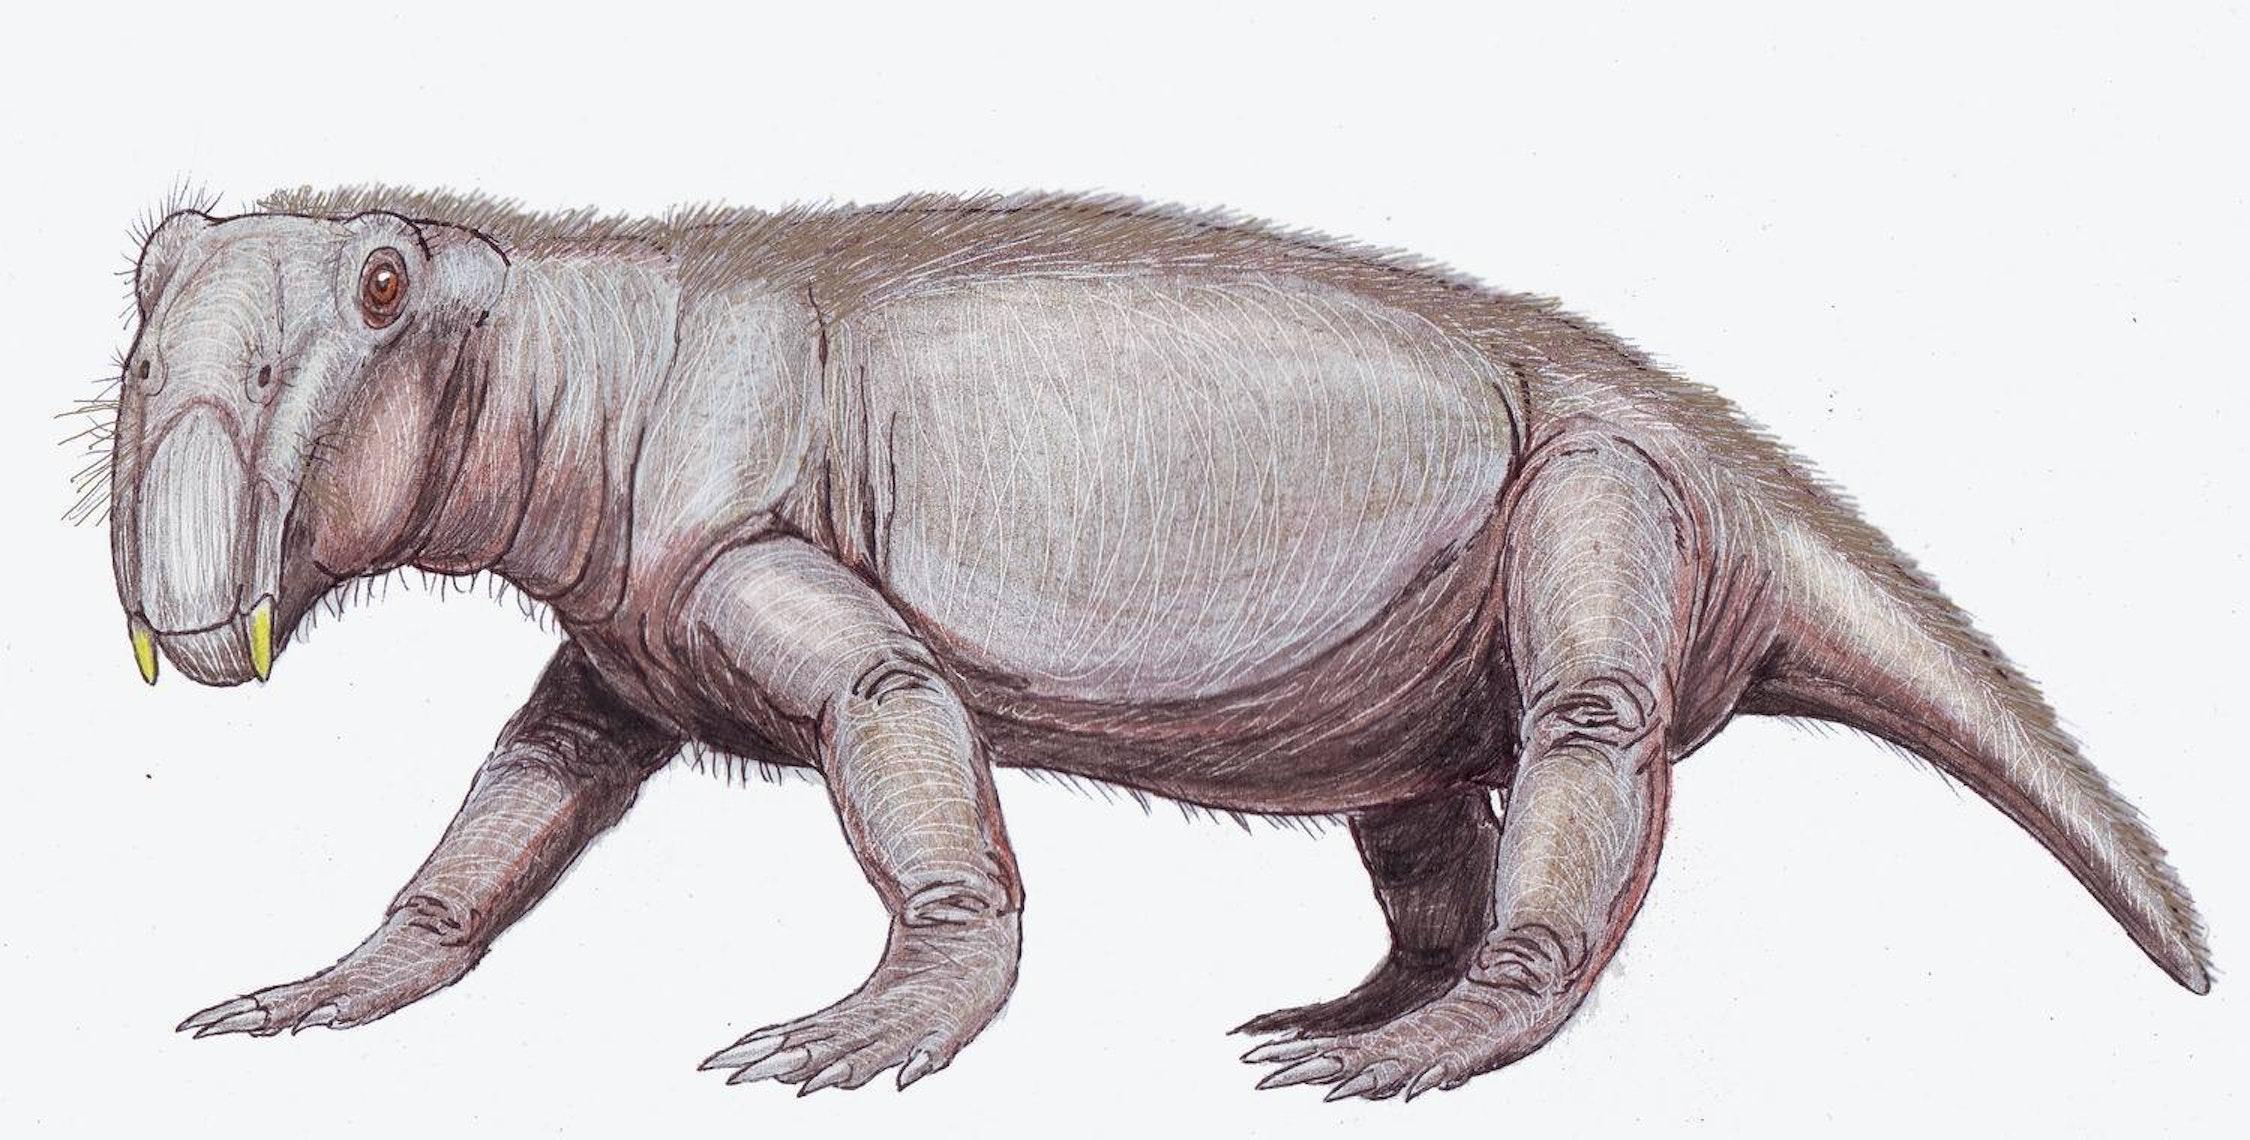 'Lystrosaurus georgi,' a proto-mammal and survivor of the Permian-Triassic extinction.